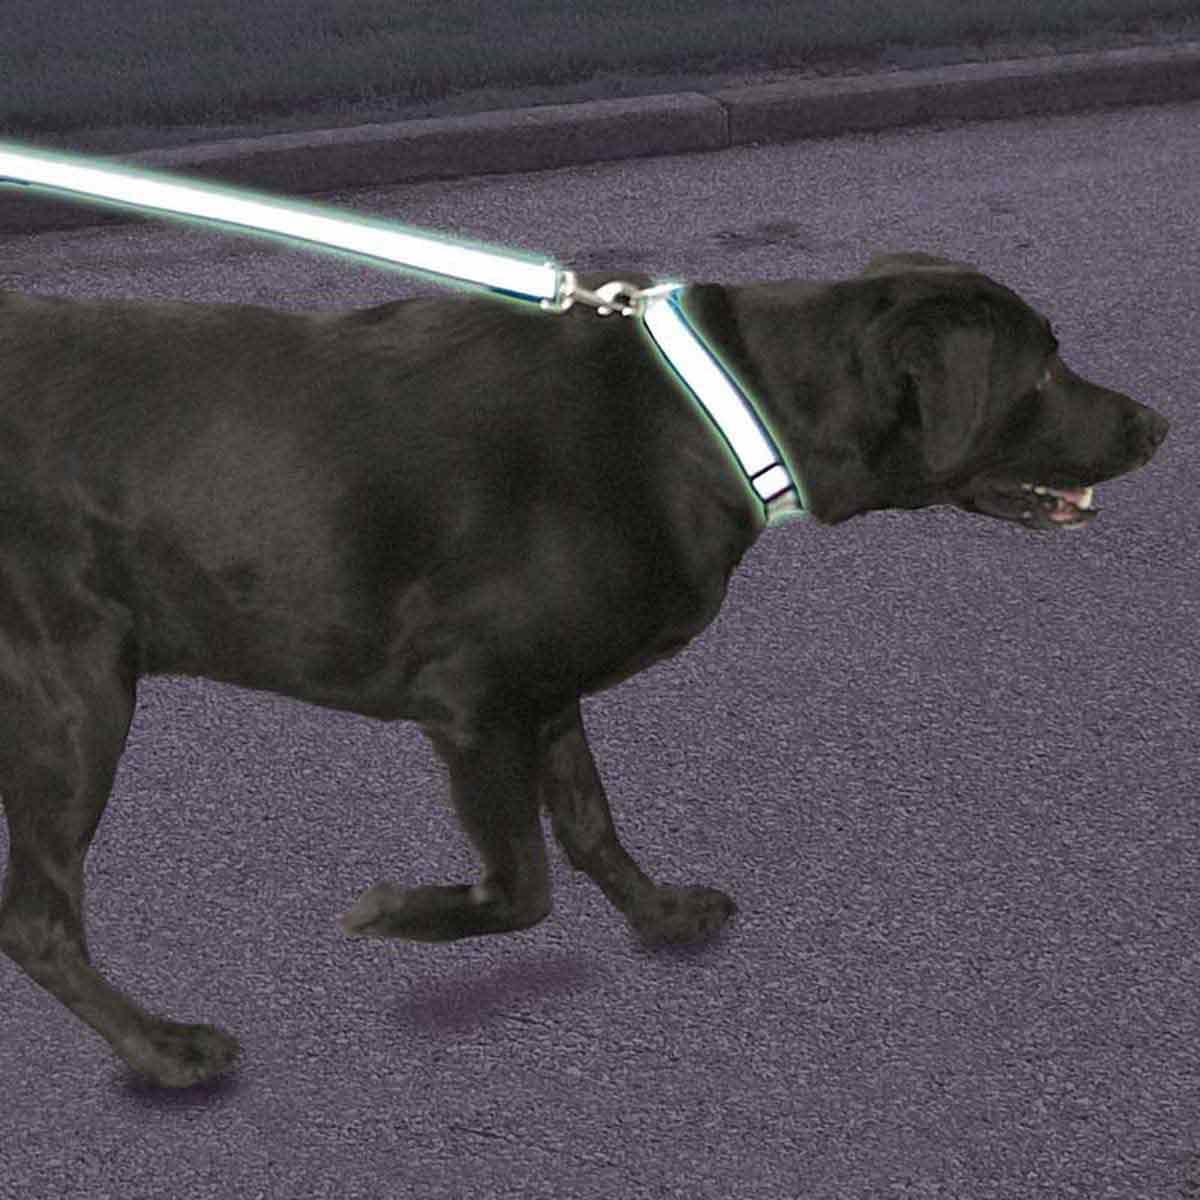 "Dog walking with Coastal Lazer Brite Reflective 3/8"" Lead 6'"